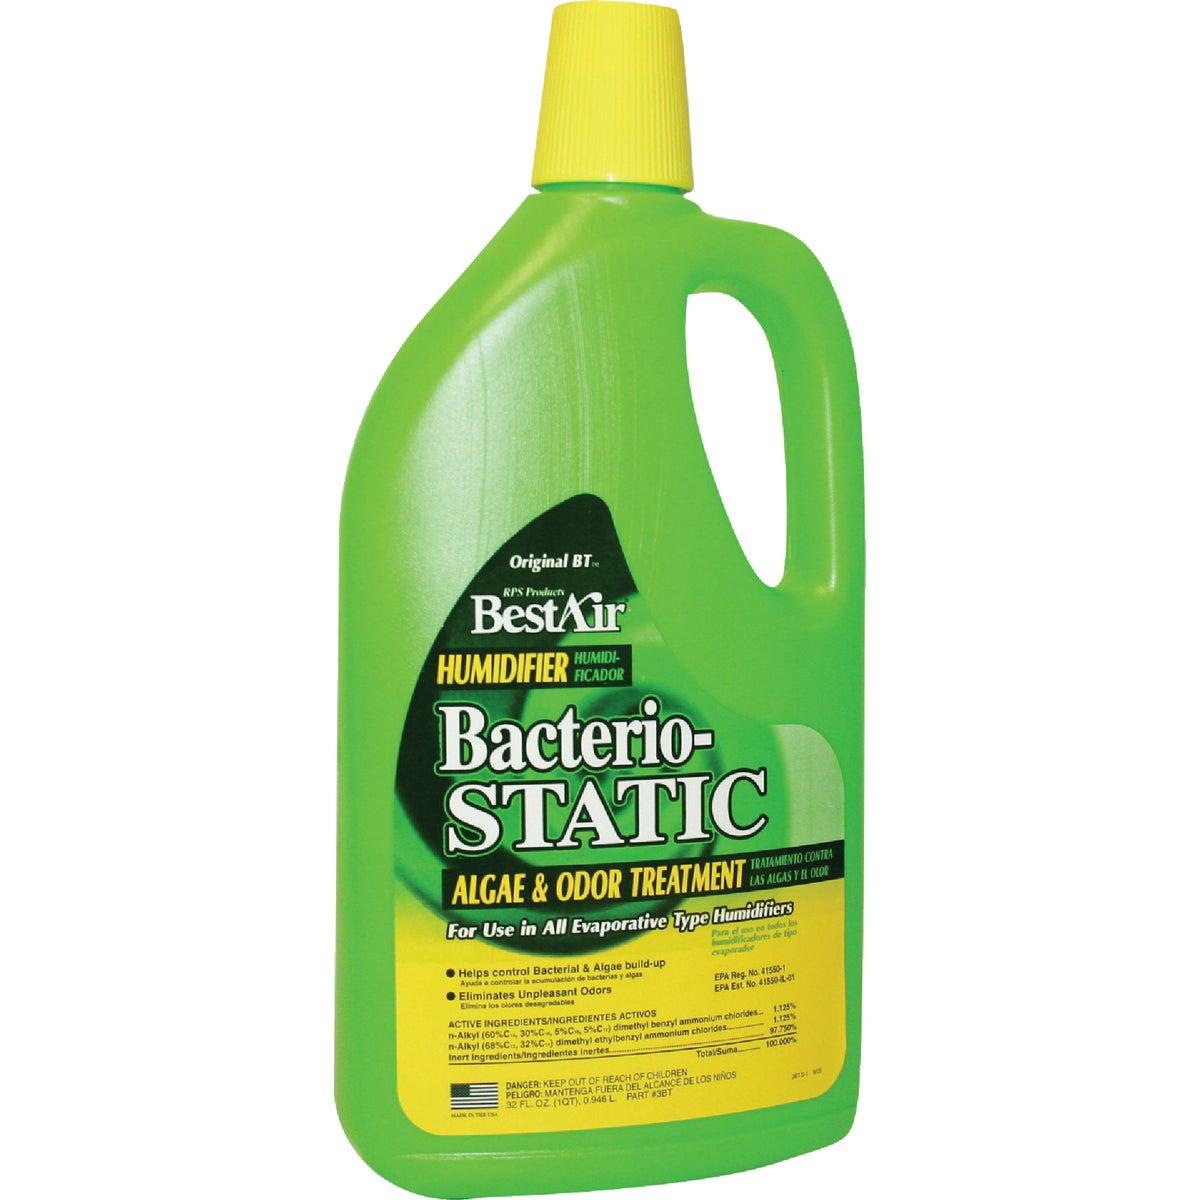 BestAir Bacteriostatic Humidifier Water Treatment